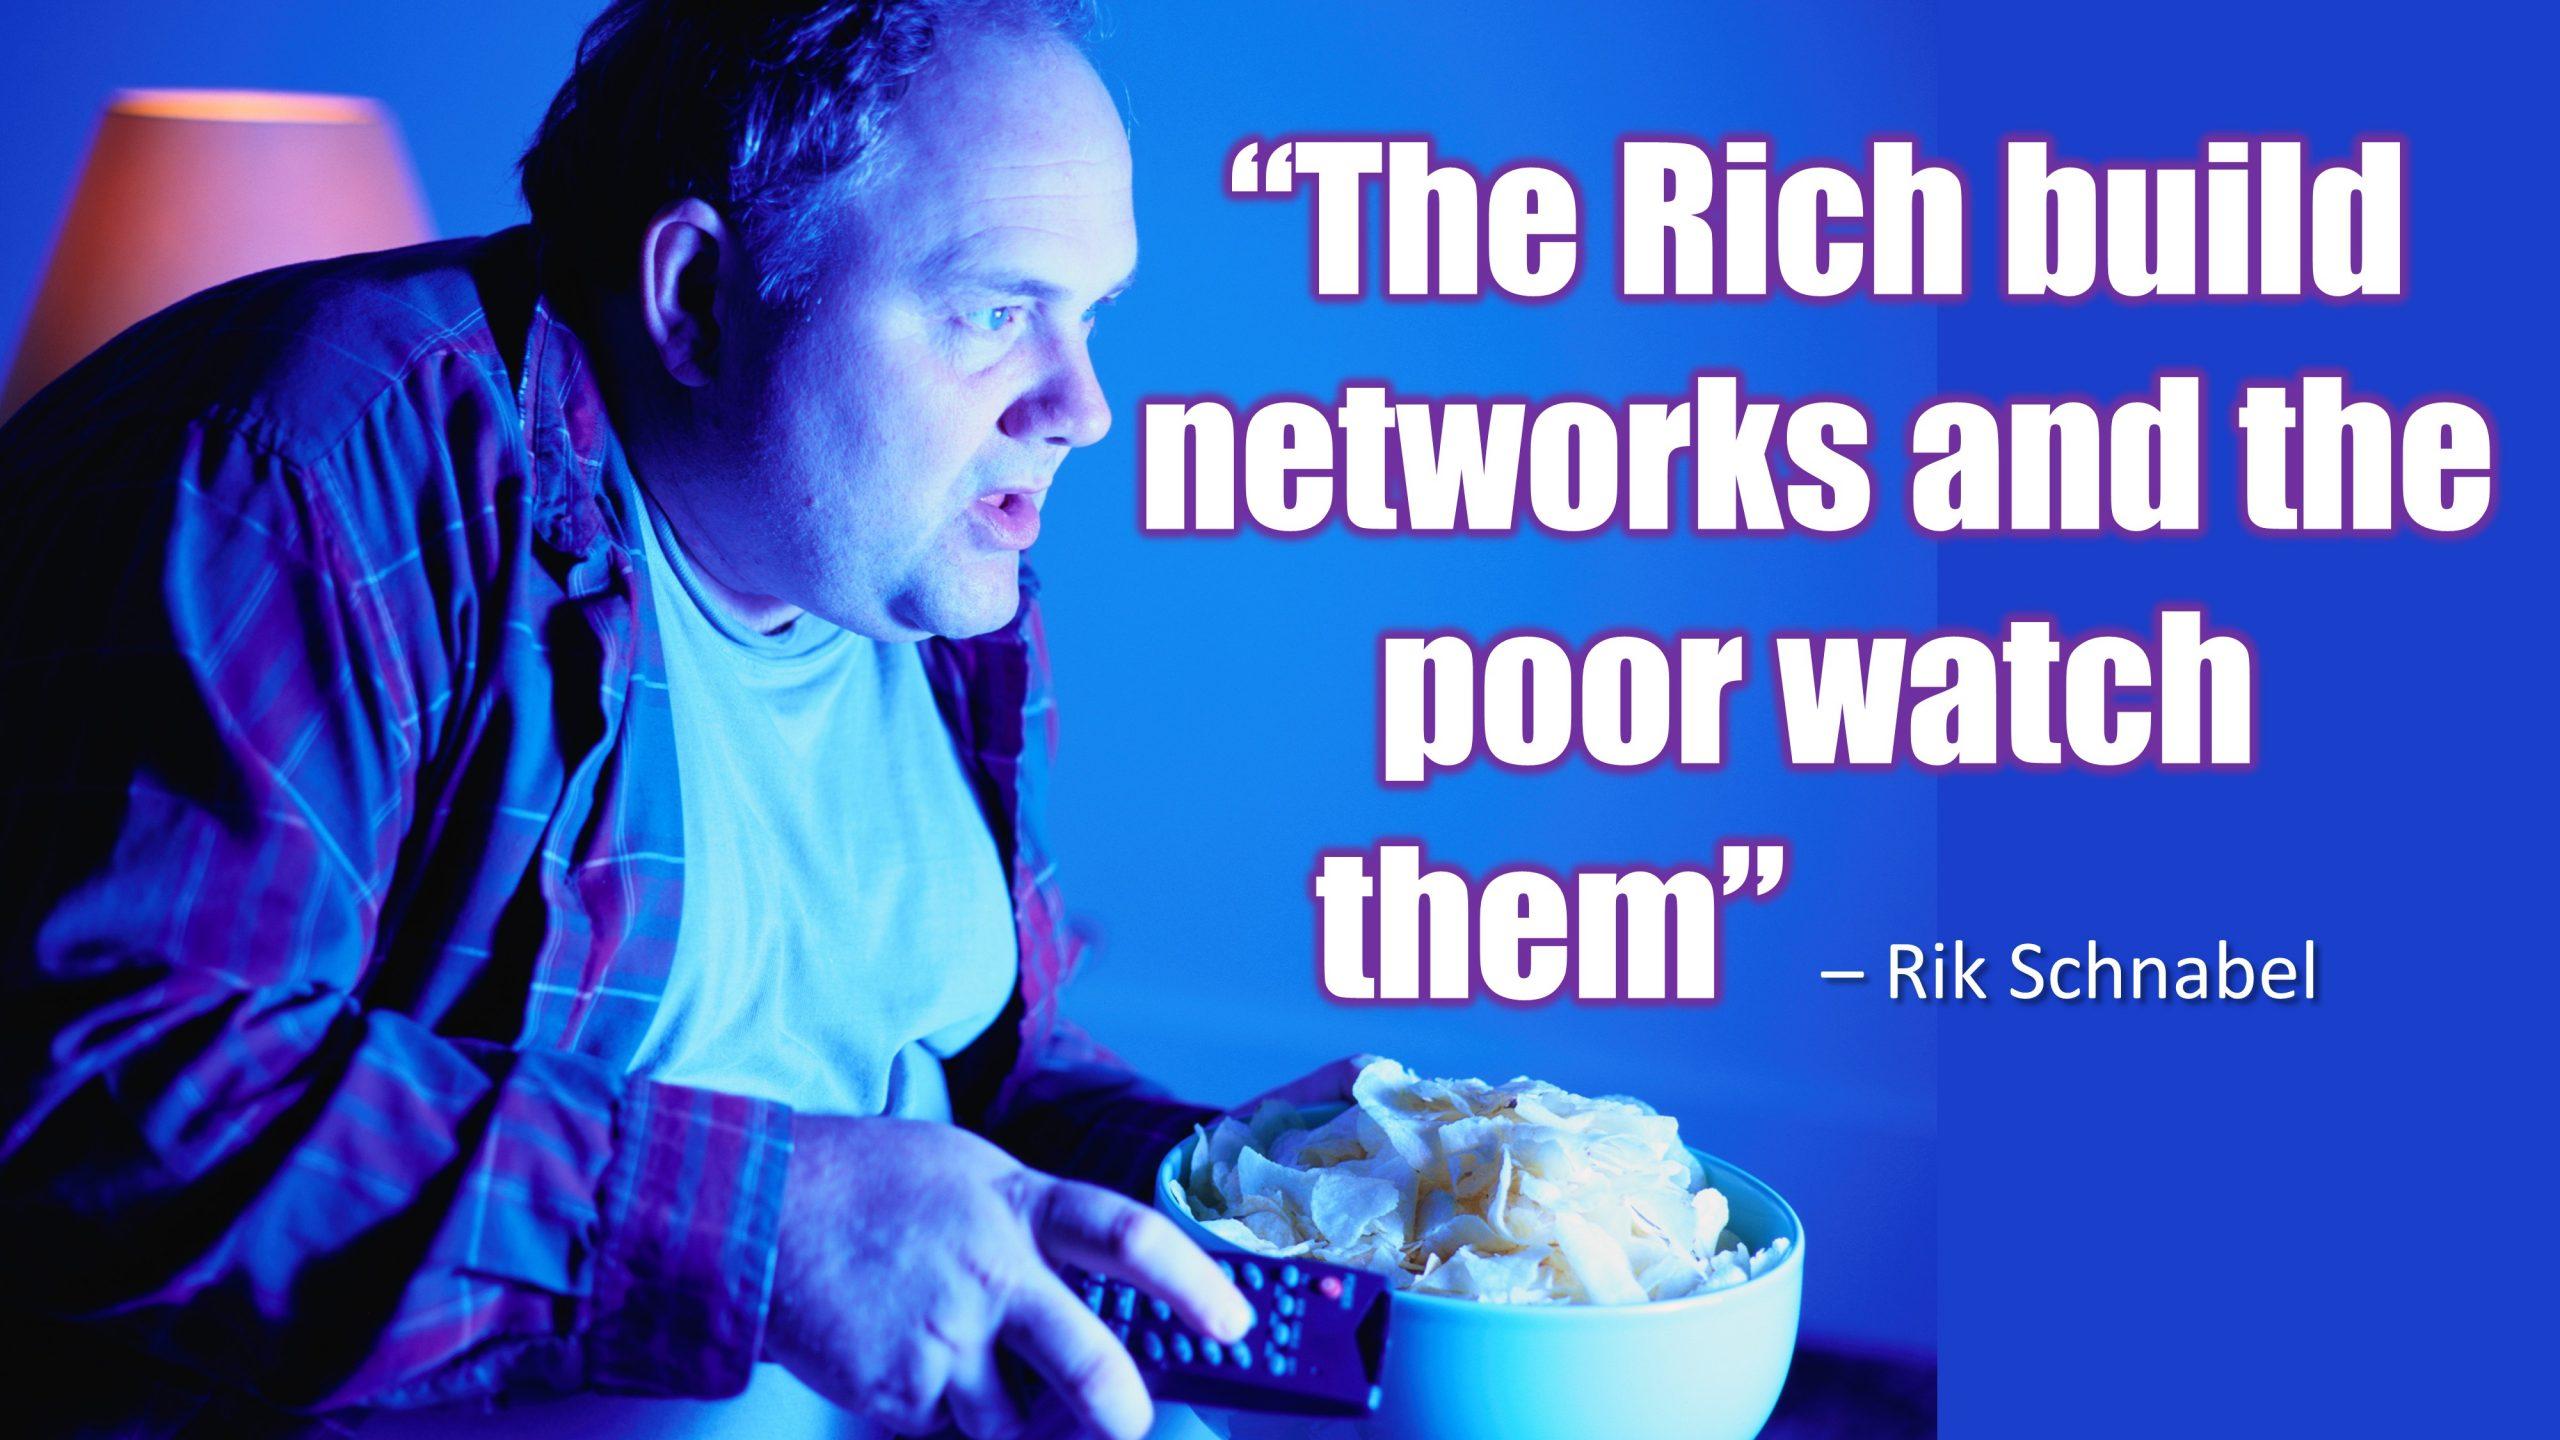 rich people